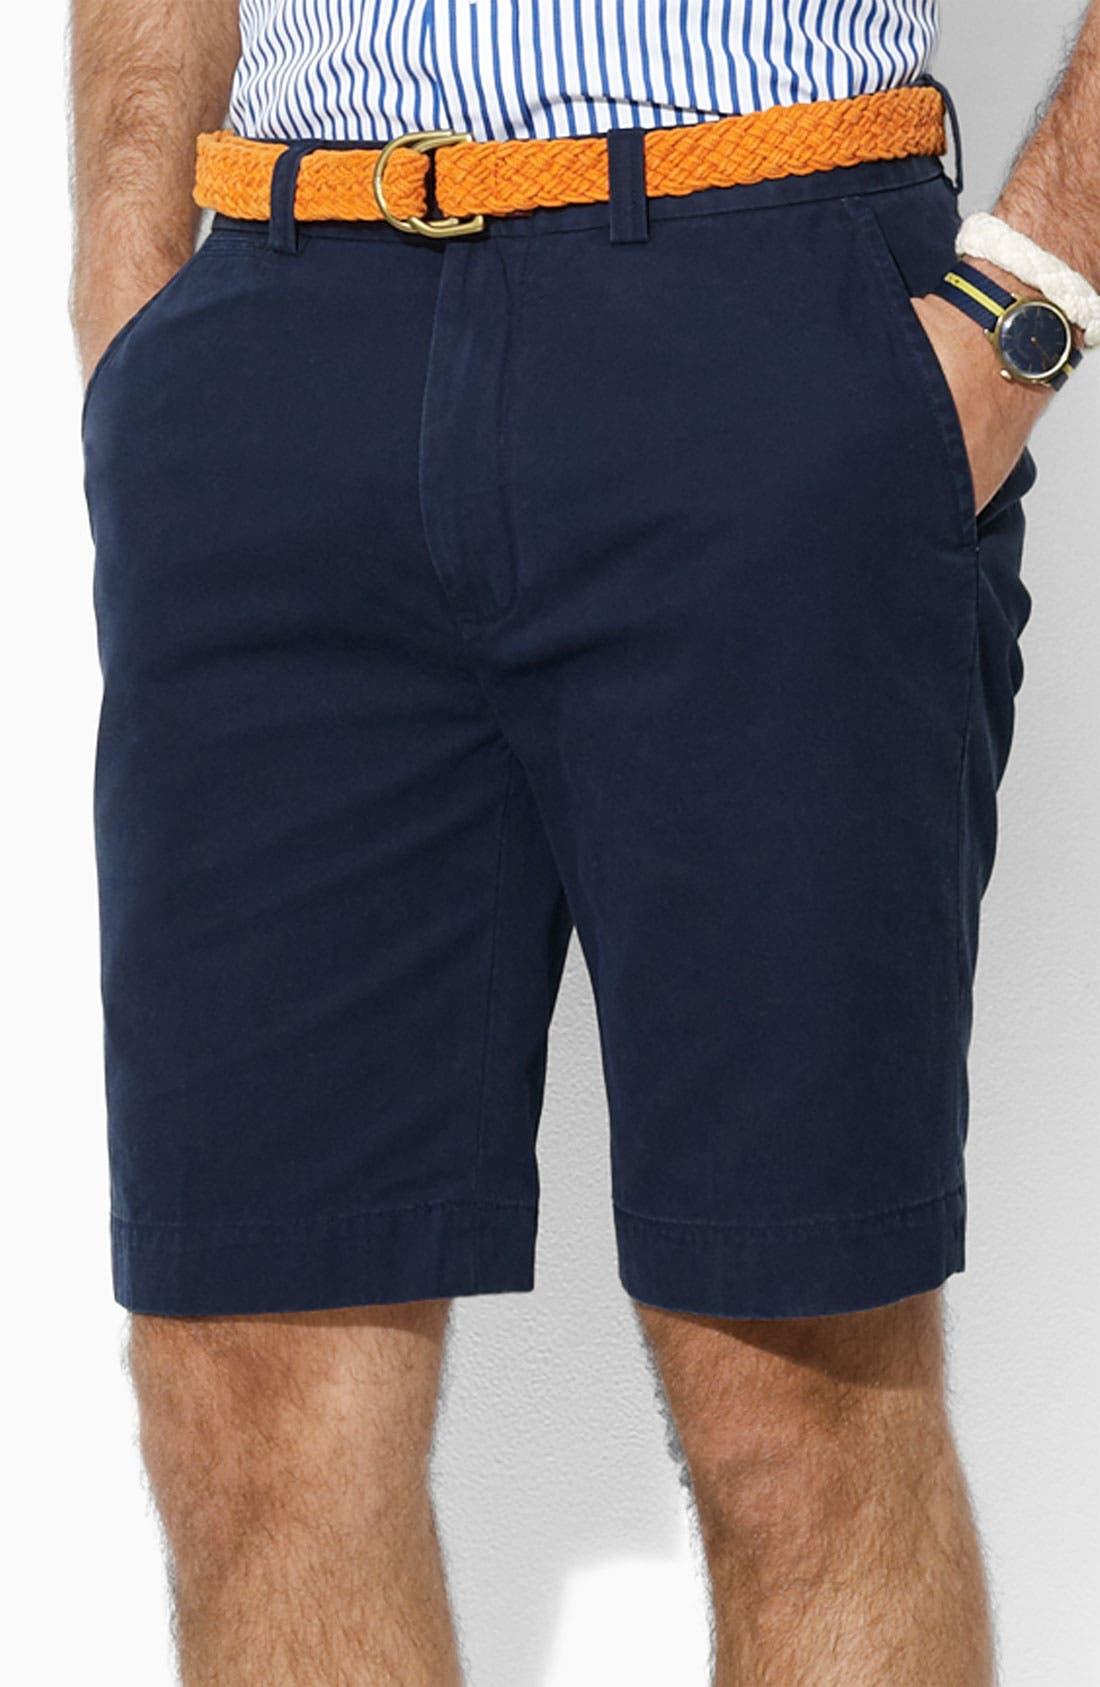 Main Image - Polo Ralph Lauren 'G.I.' Classic Fit Shorts